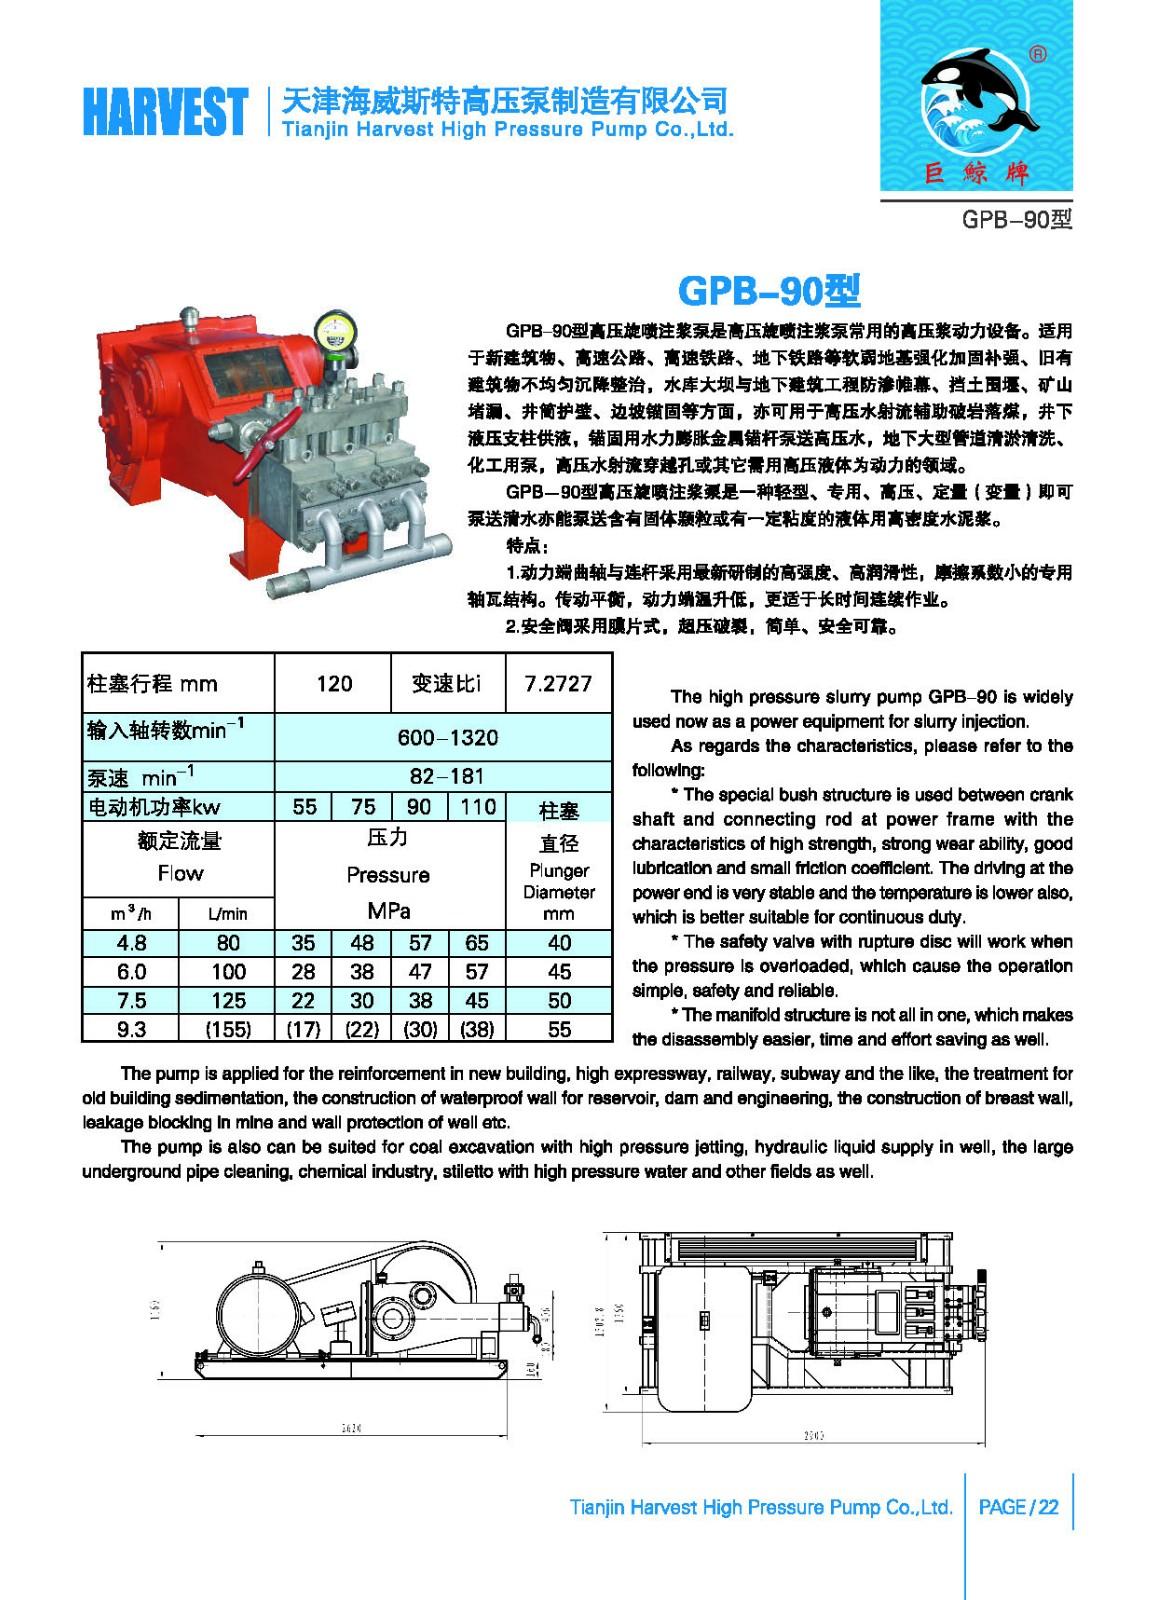 GBP-90参数表.jpg